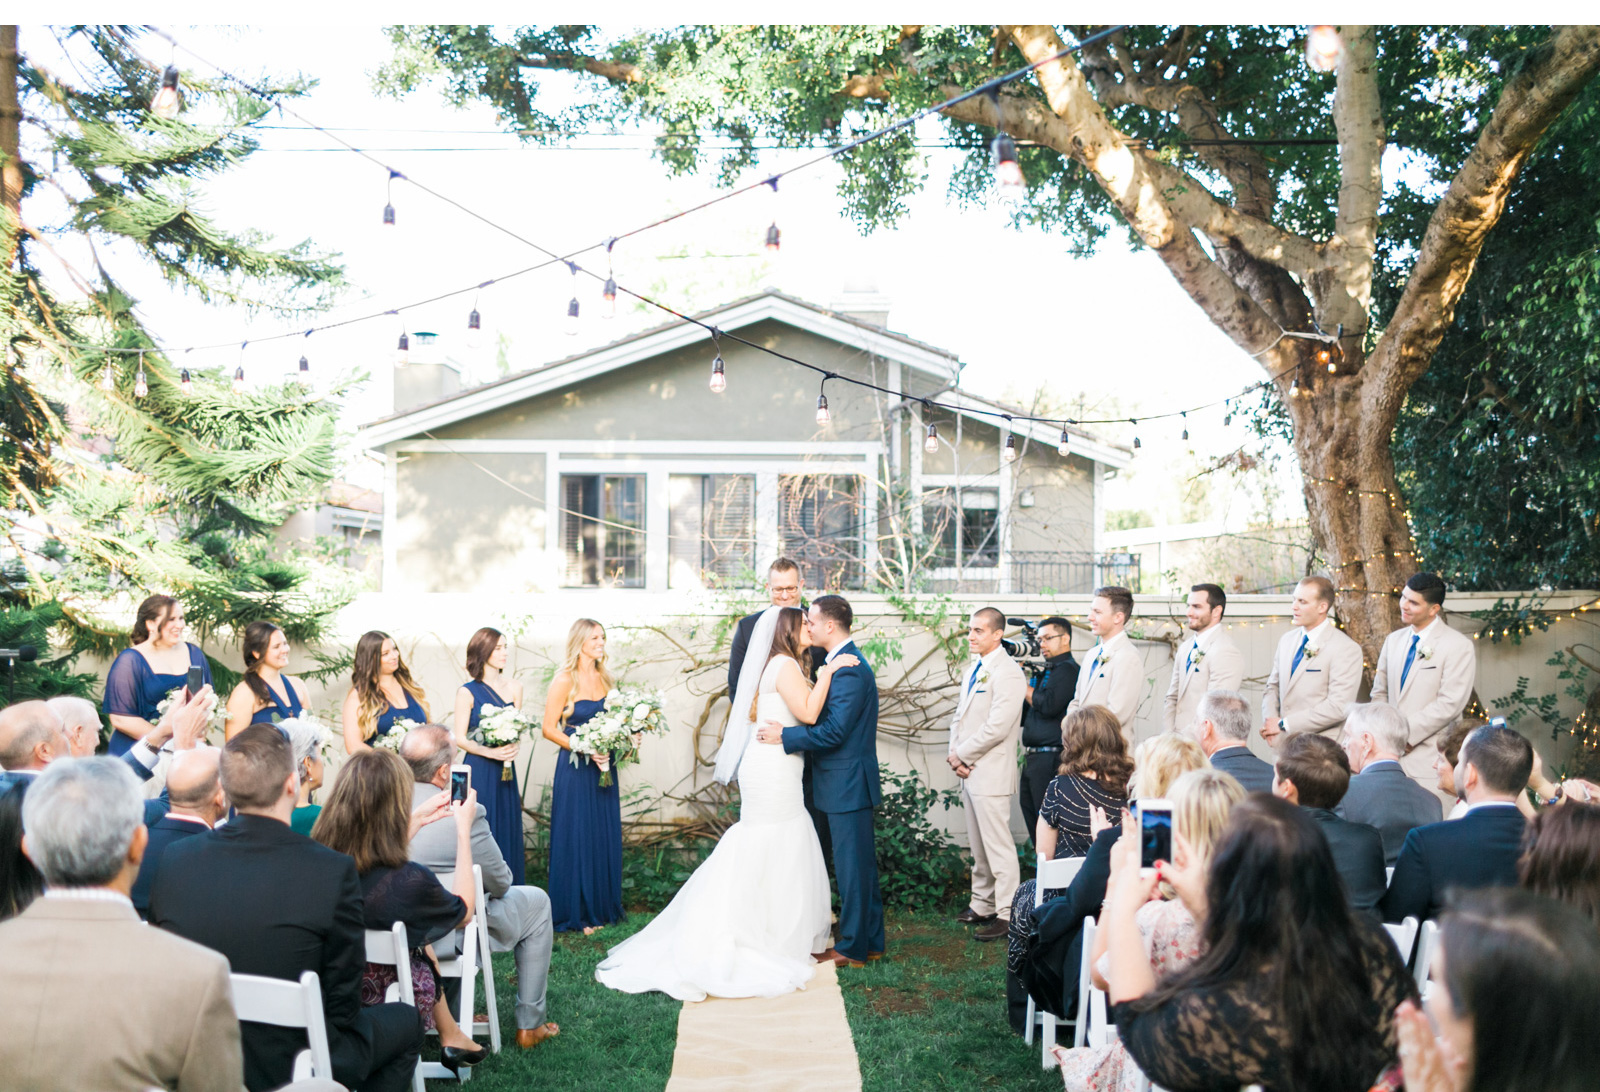 Jon-&-Amanda-Dougher's-Backyard-Wedding-Natalie-Schutt-Photography_07.jpg